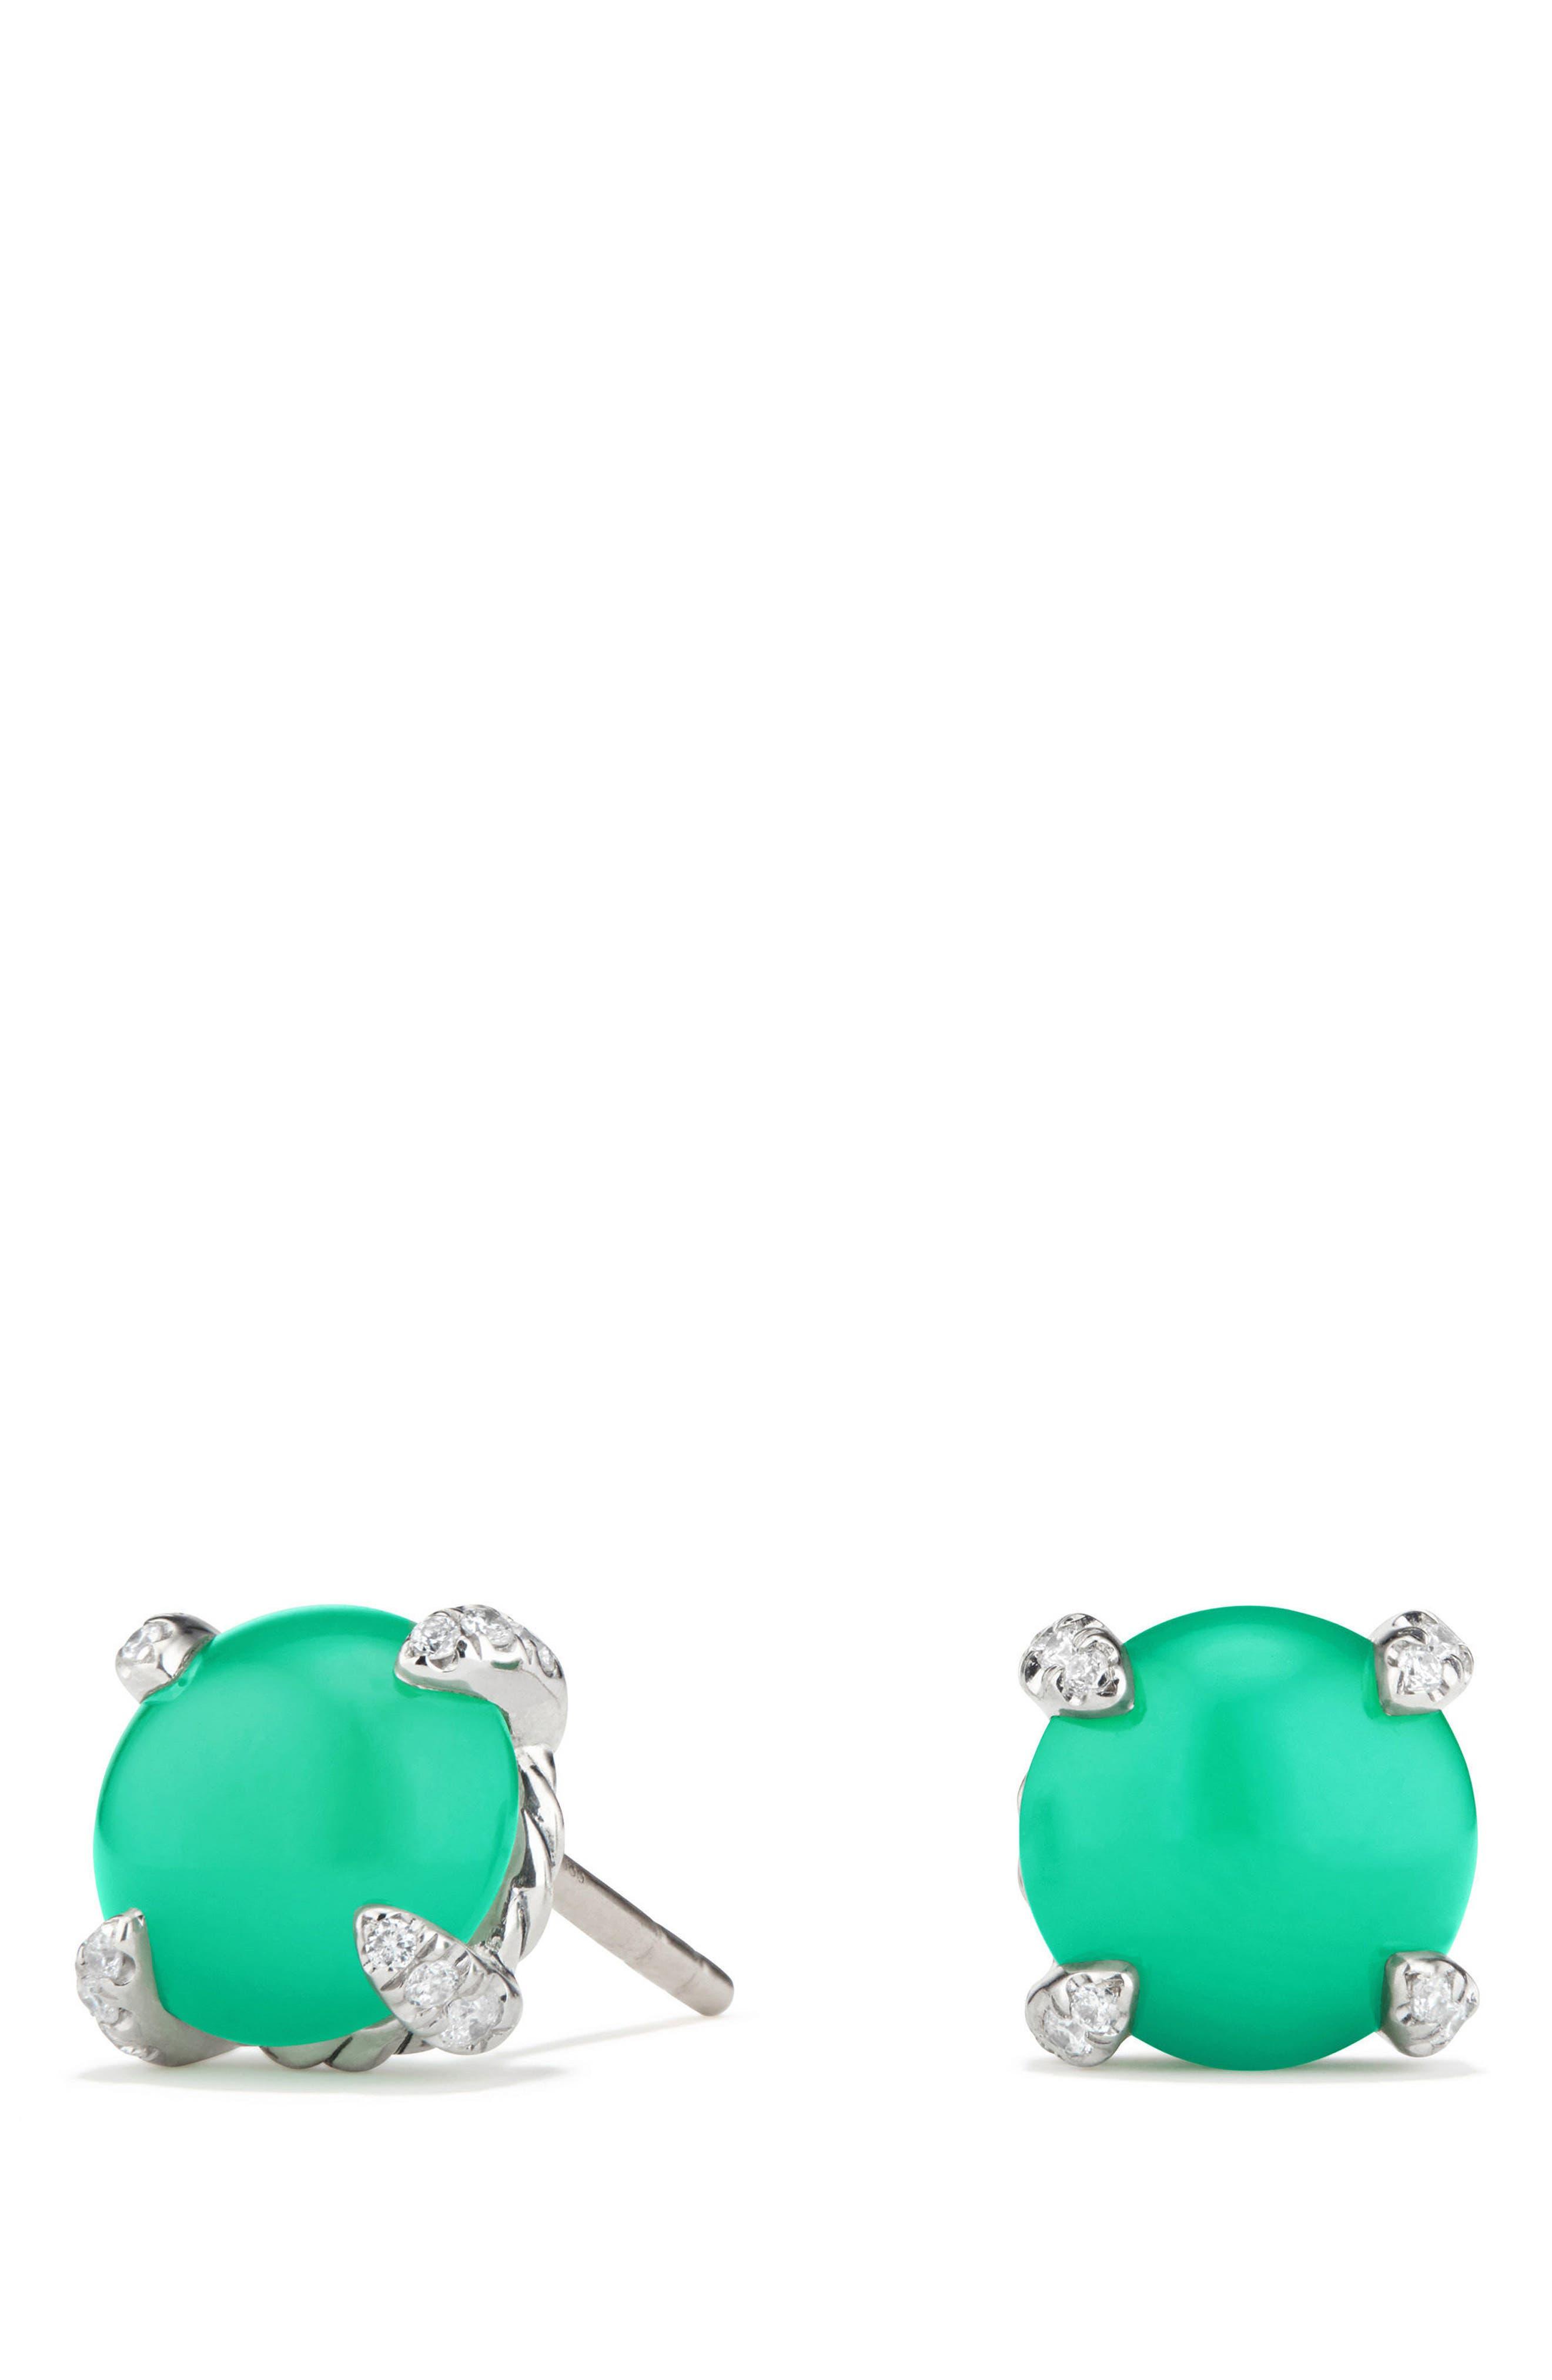 David Yurman Chatelaine® Stud Earrings with Gemstone & Diamond